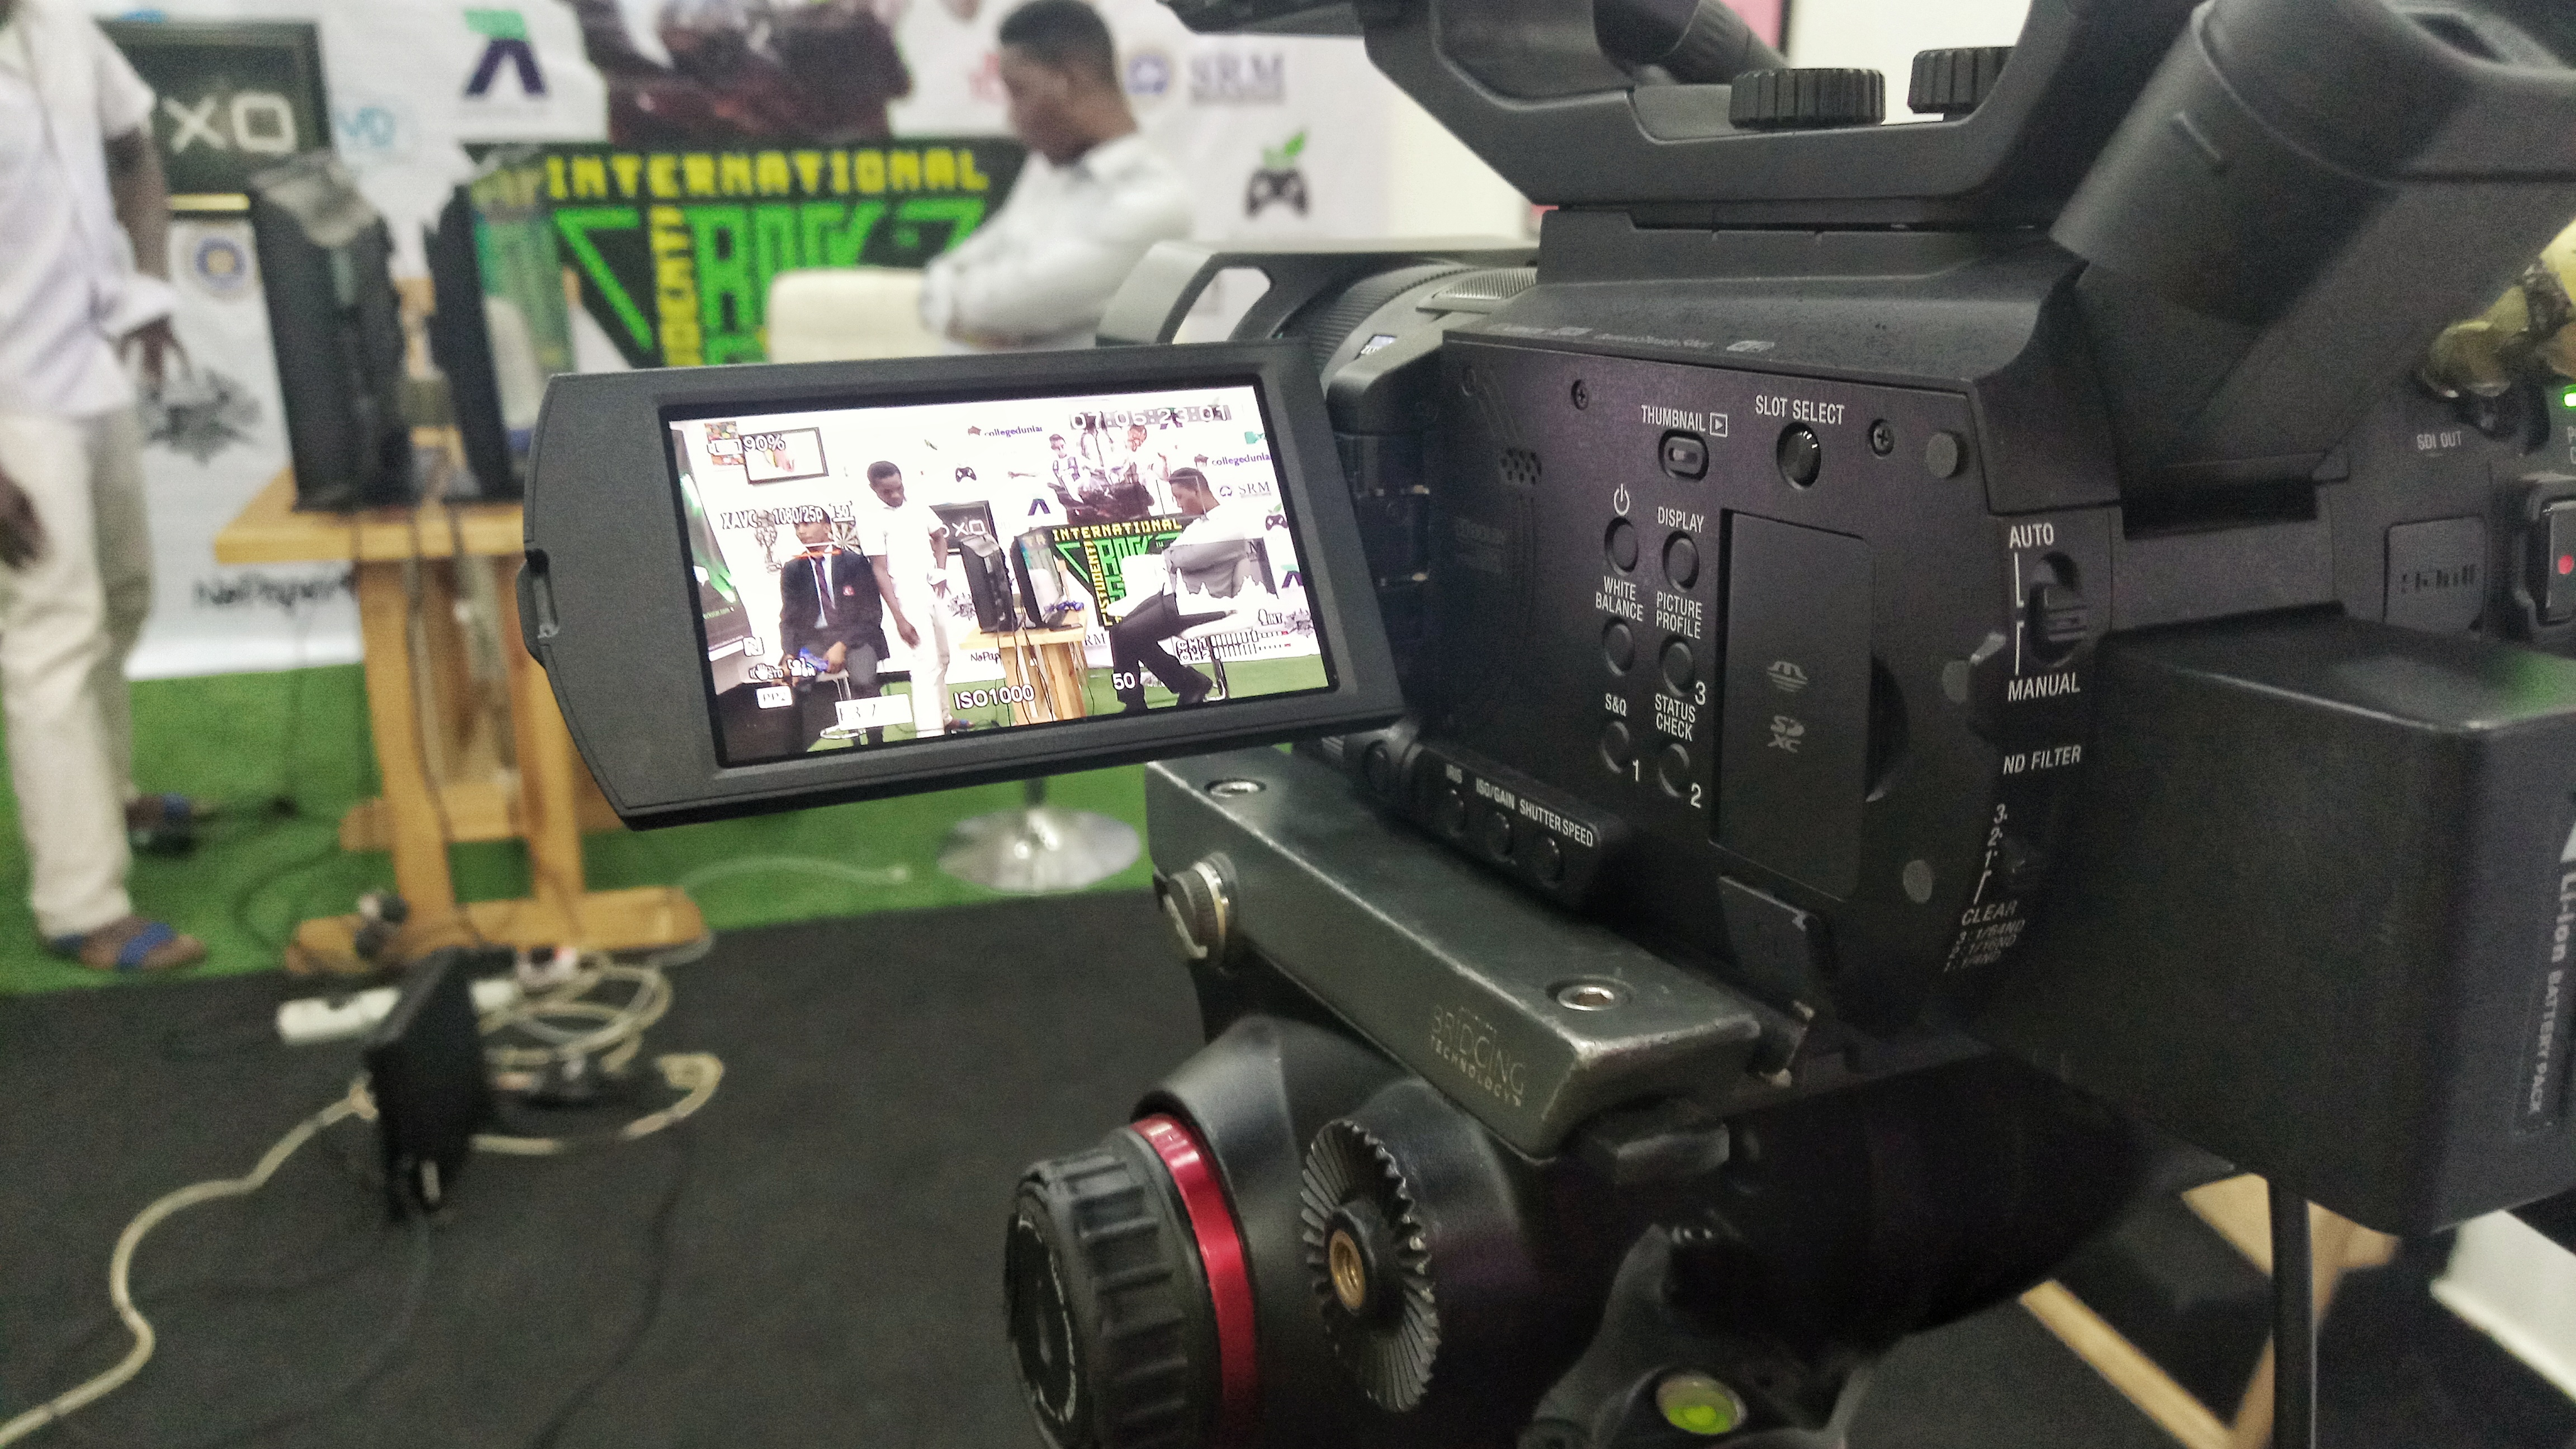 IMG 20190524 164926 0 01 - International Student Rockstar League Holds Nigerian Qualifiers.